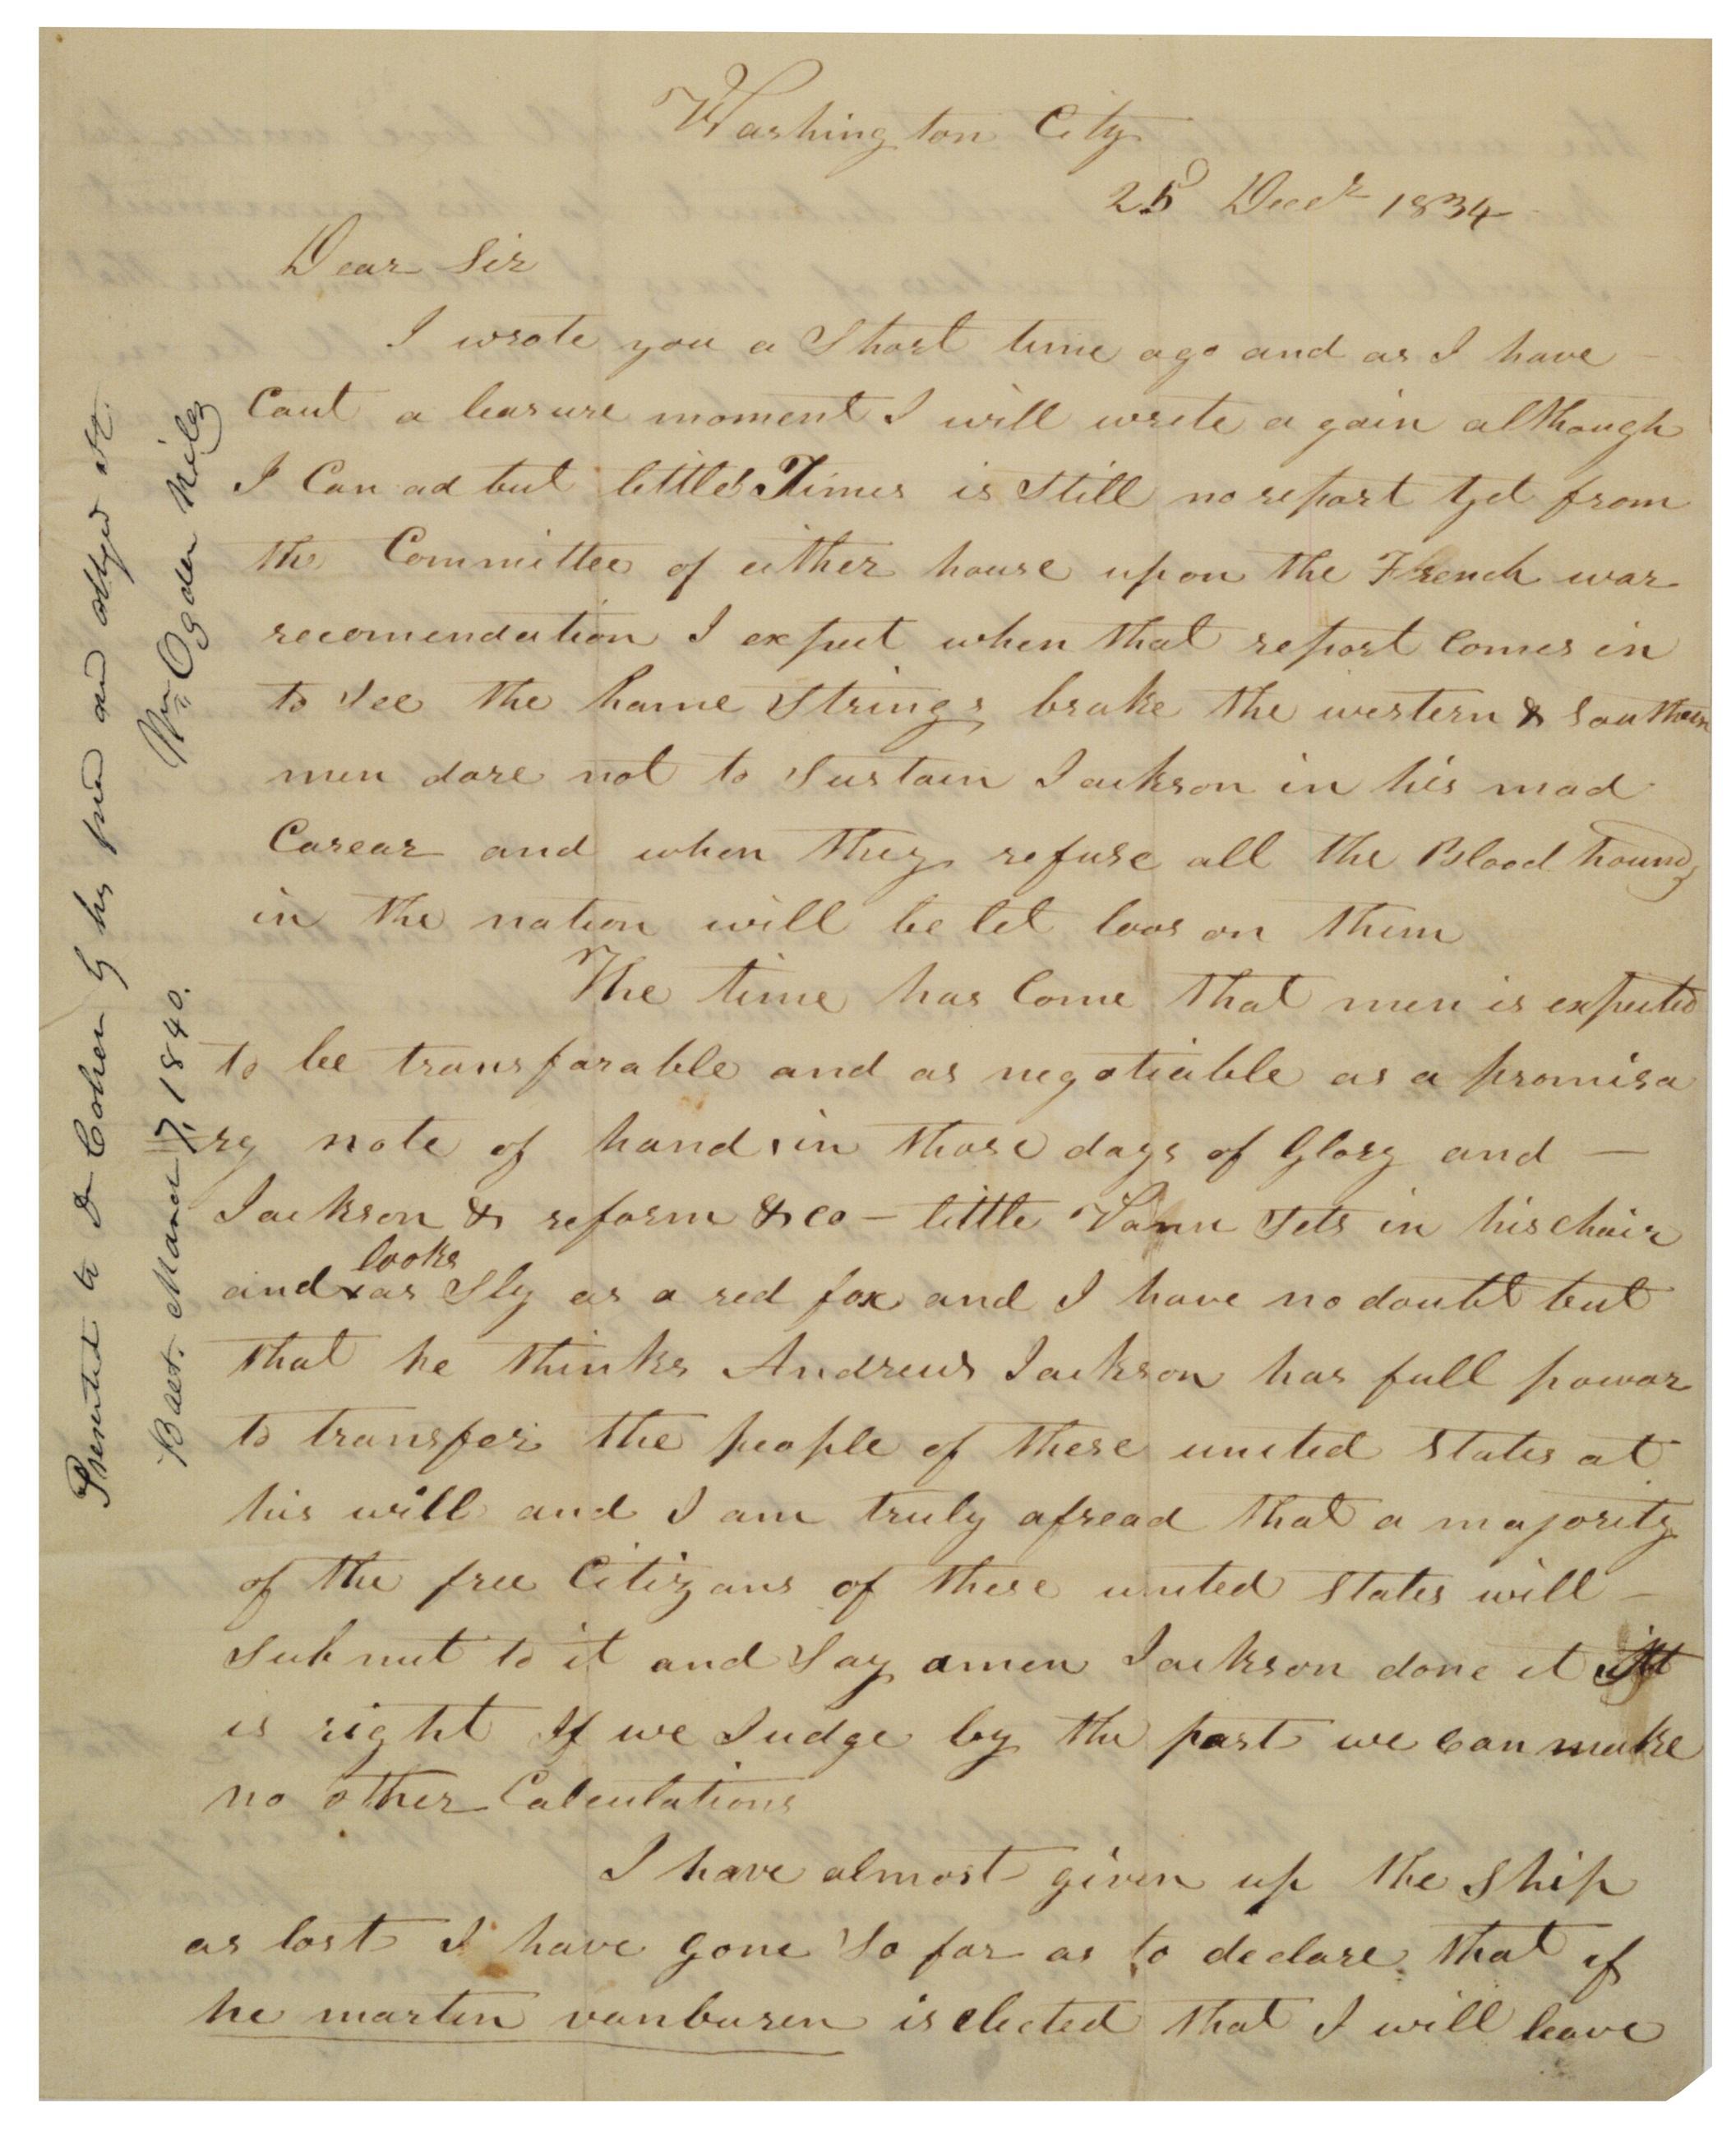 David Crockett to Charles Schultz, December 25, 1834 (Gilder Lehrman Collect